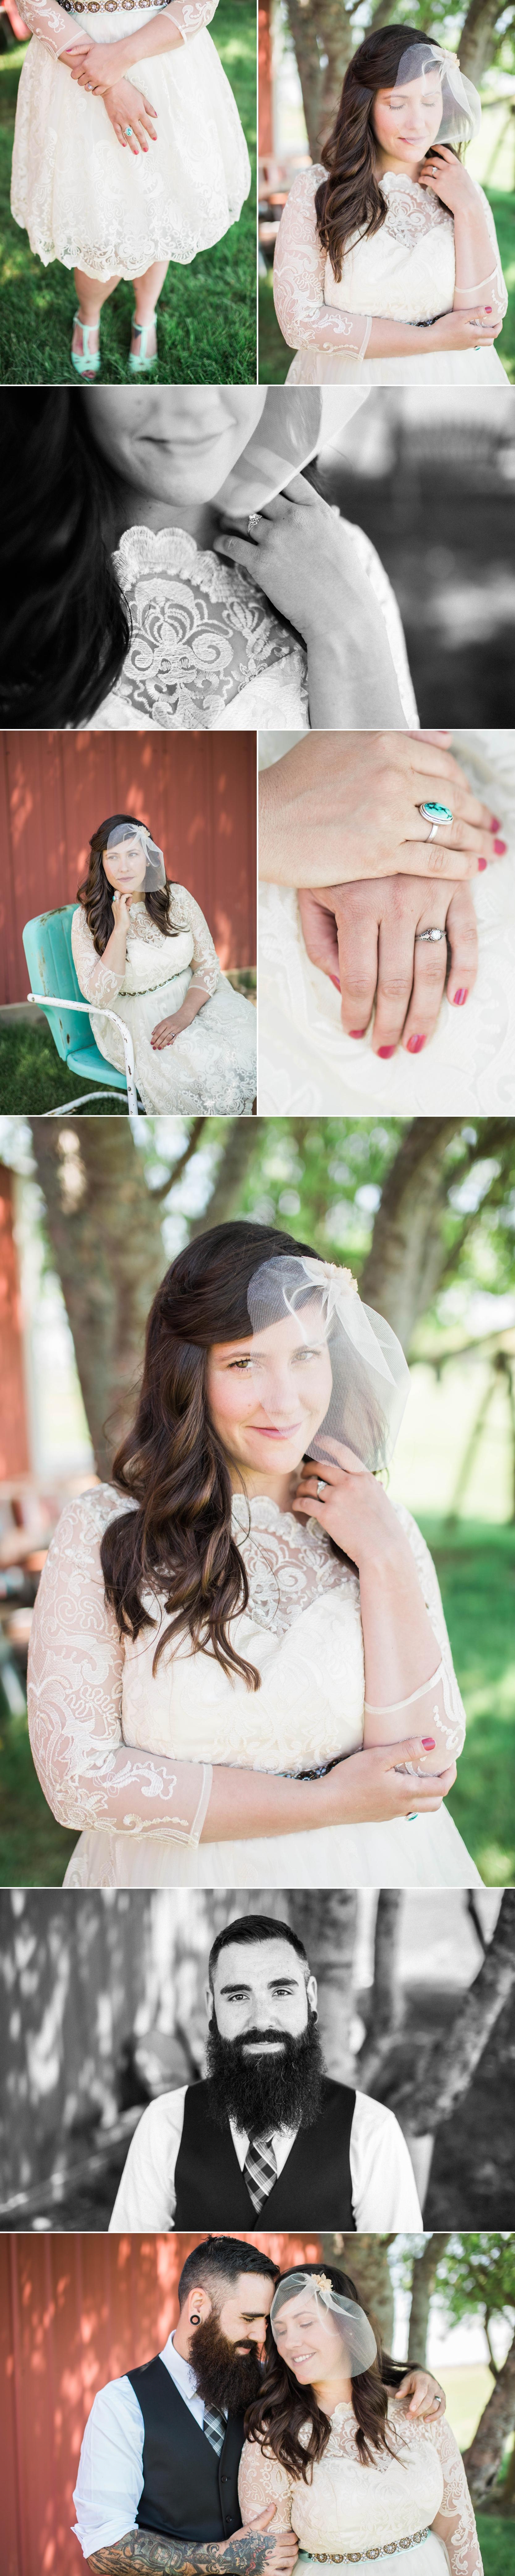 wedding-midwest-indiana-bride-groom-hike-pond-midwest wedding-tattoo-vintage